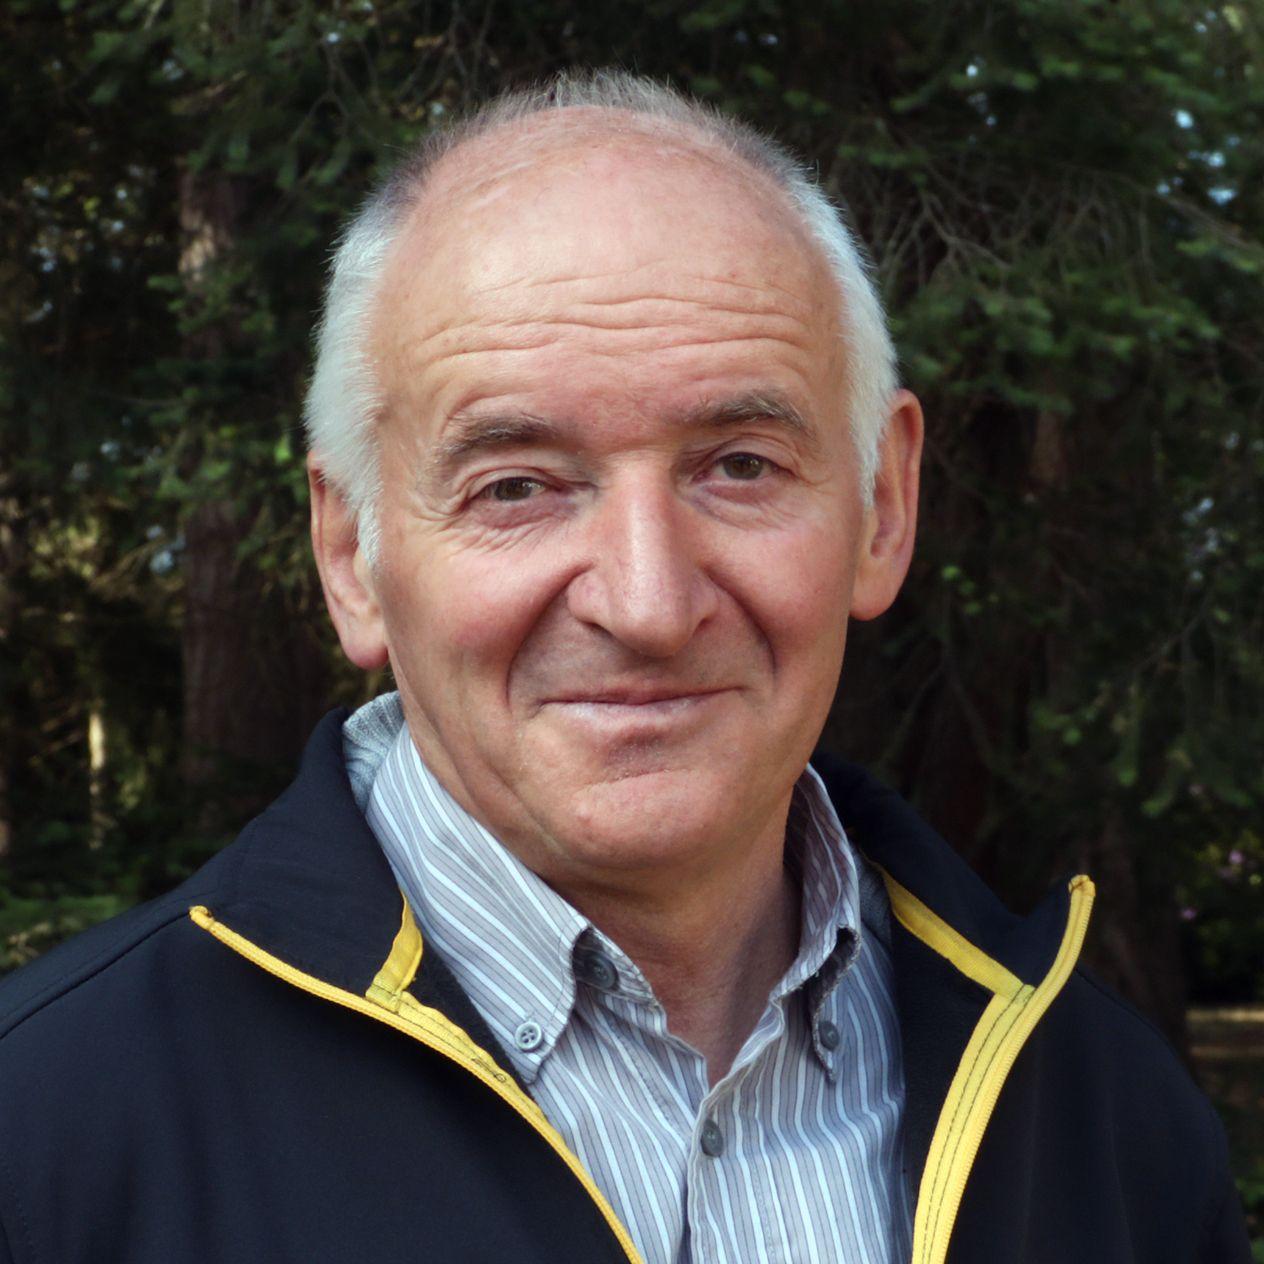 Président CR du Doubs-Territoire de Belfort